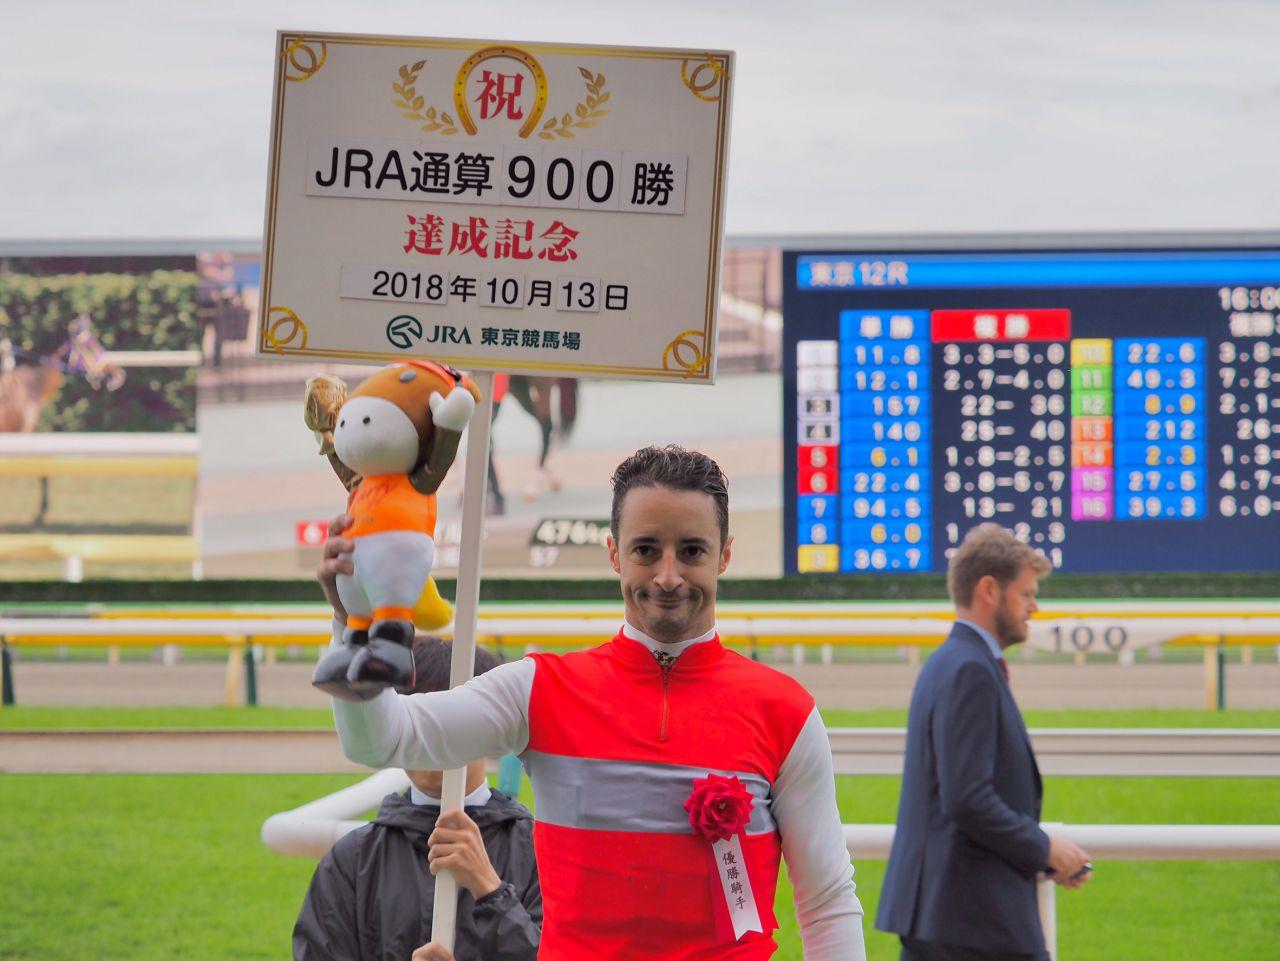 C.ルメール騎手 府中牝馬ステークスでJRA通算900勝達成!